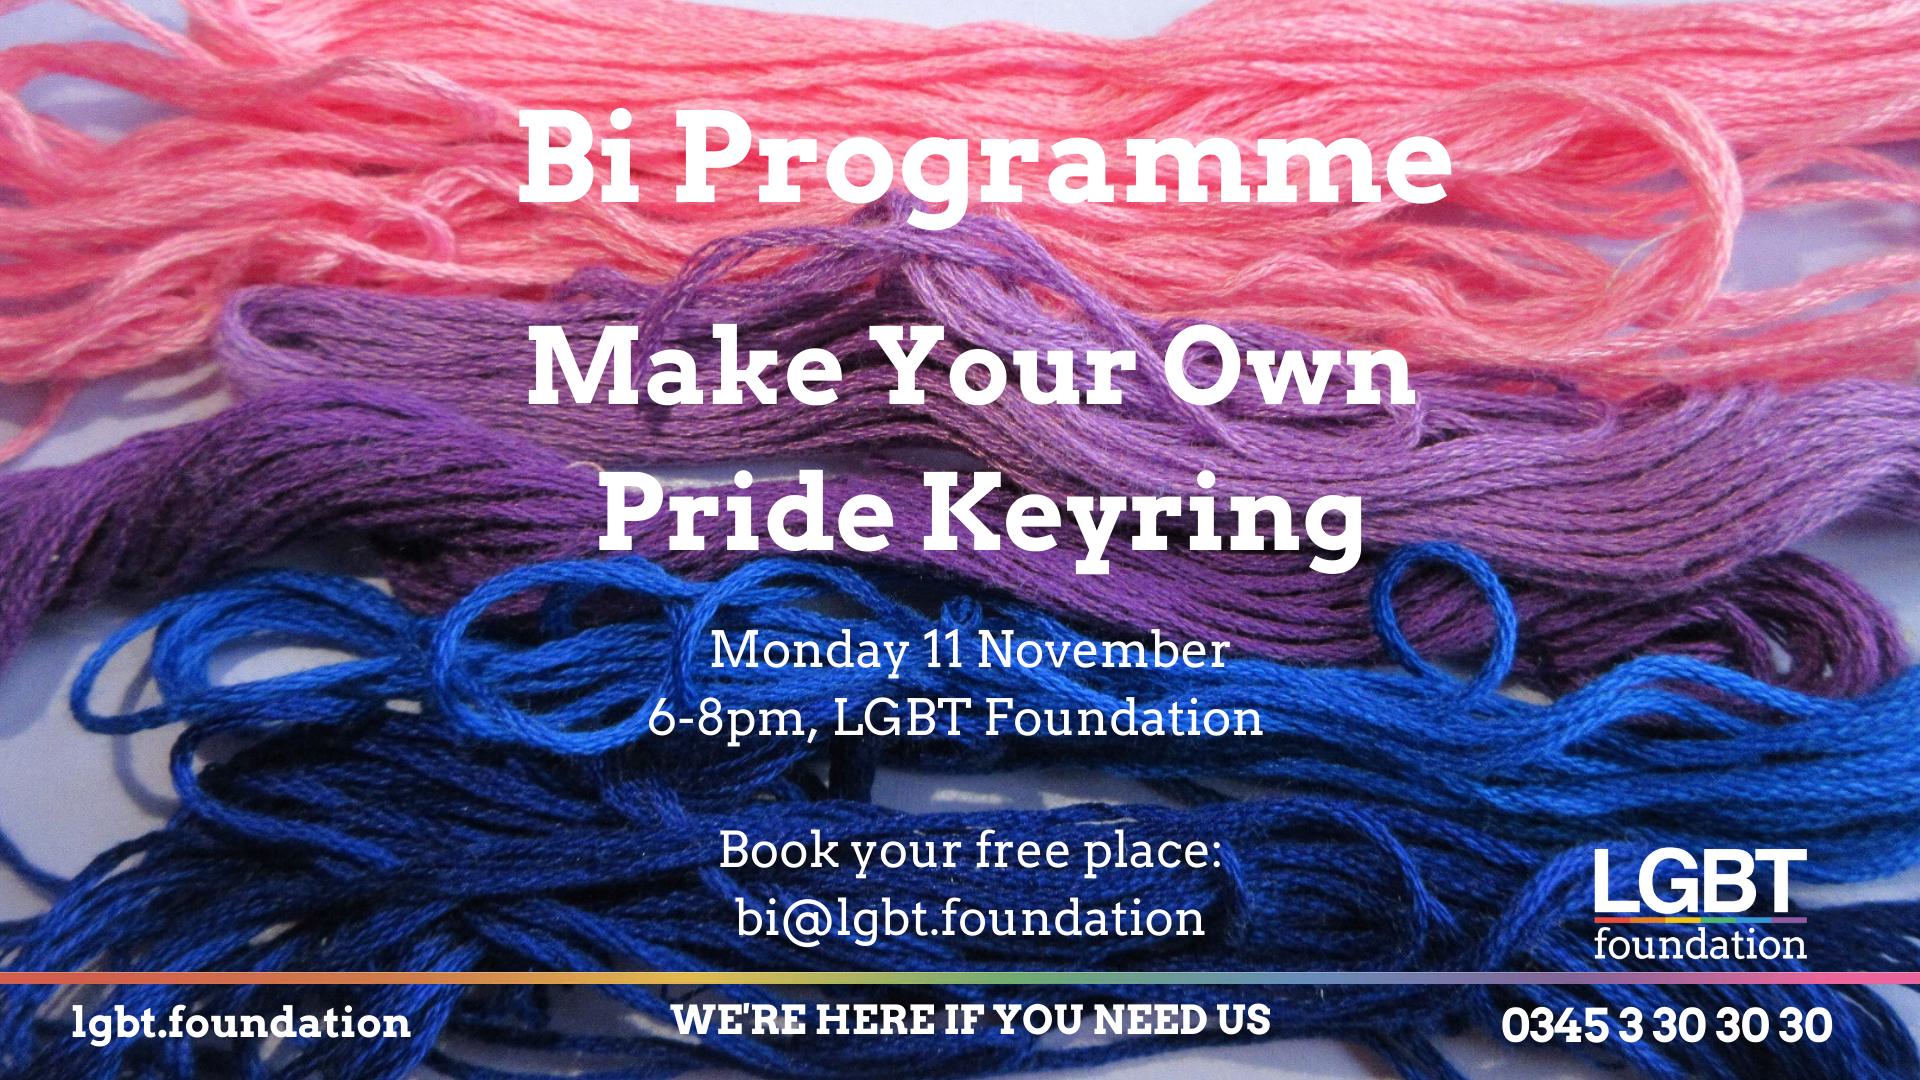 Make your own Pride Keyring